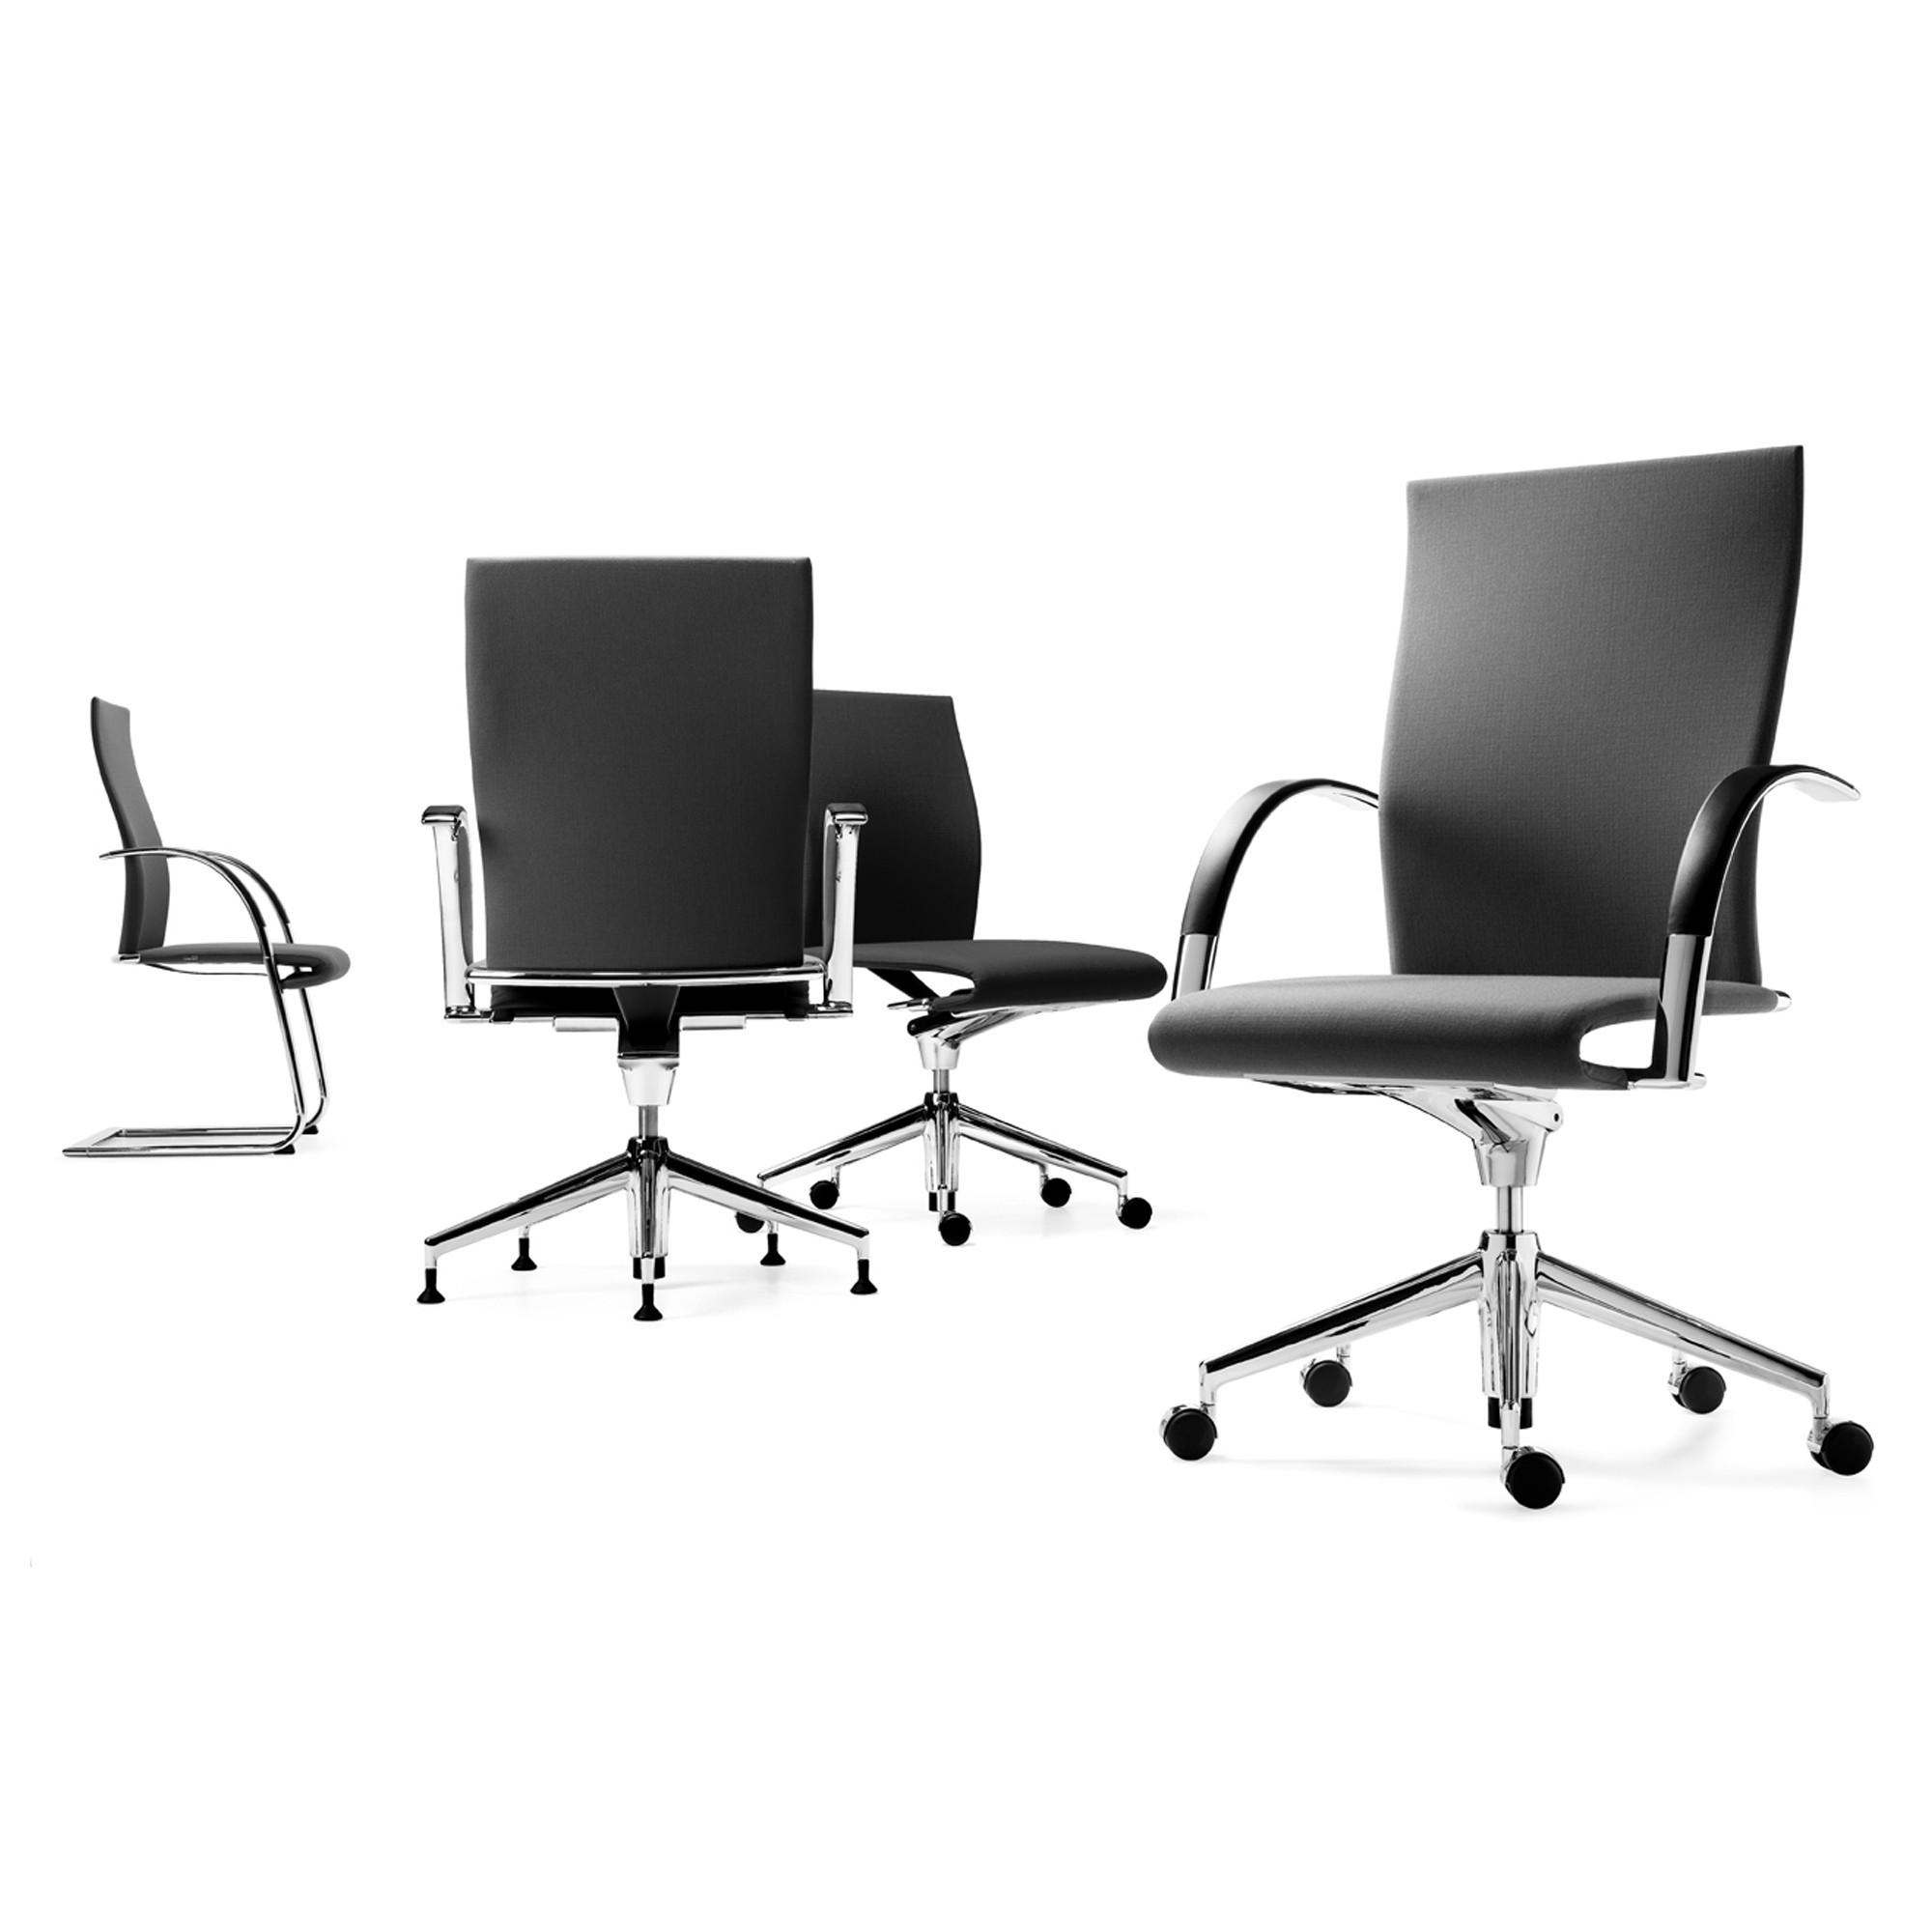 Ahrend 350 Swivel Chairs